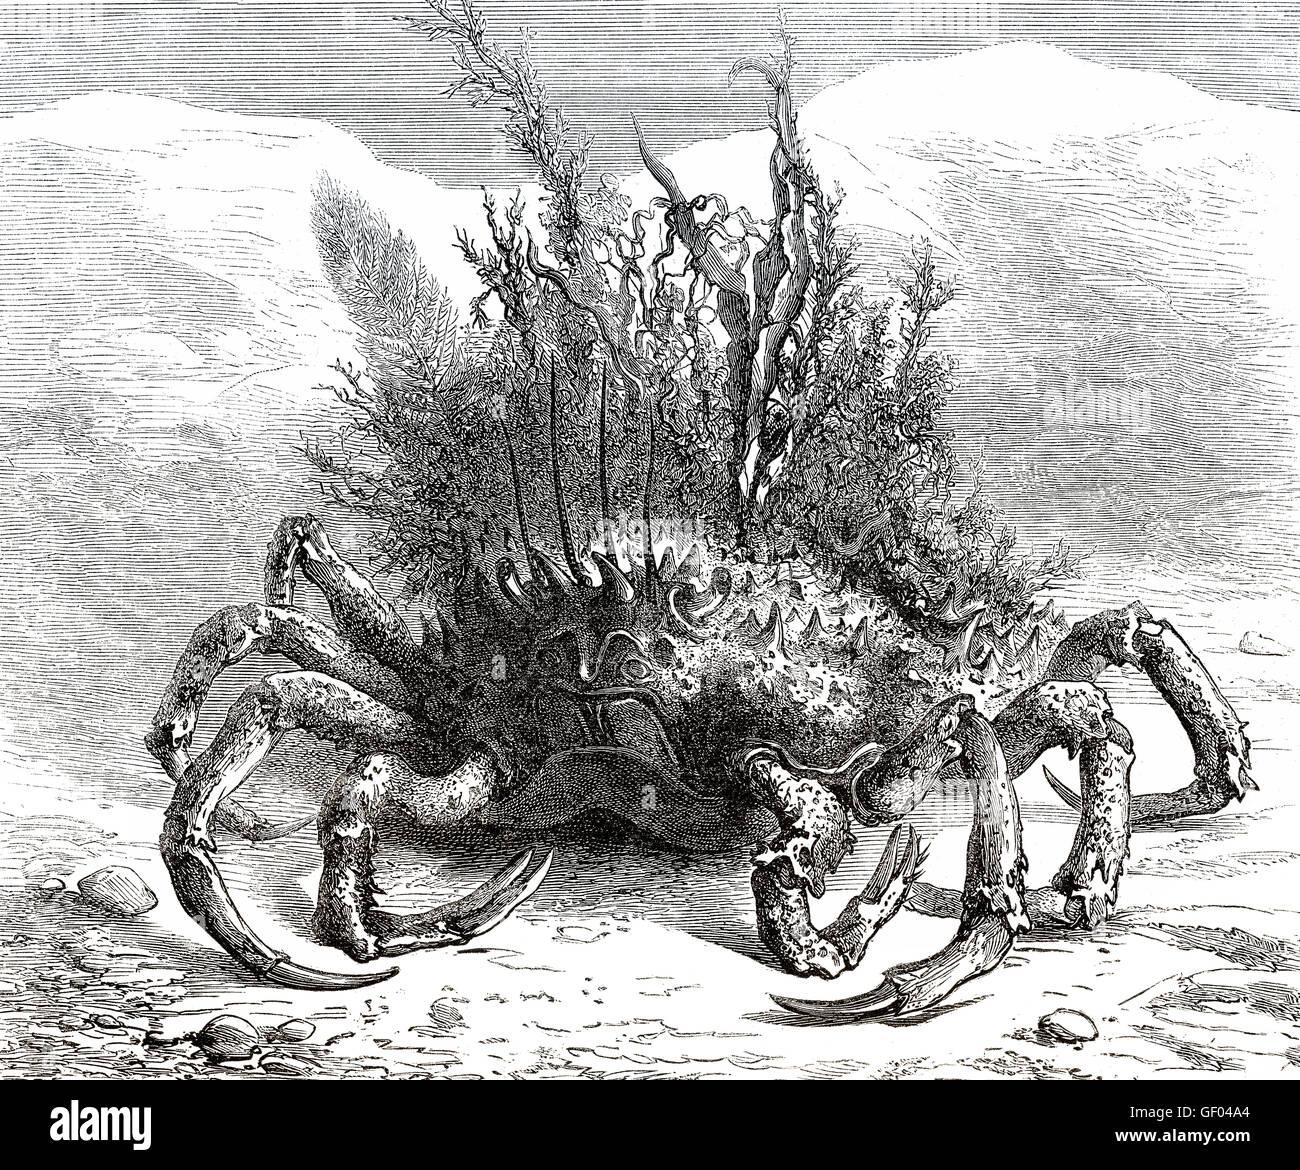 Maja squinado, the European spider crab, spiny spider crab or spinous spider crab, a species of migratory crab found - Stock Image